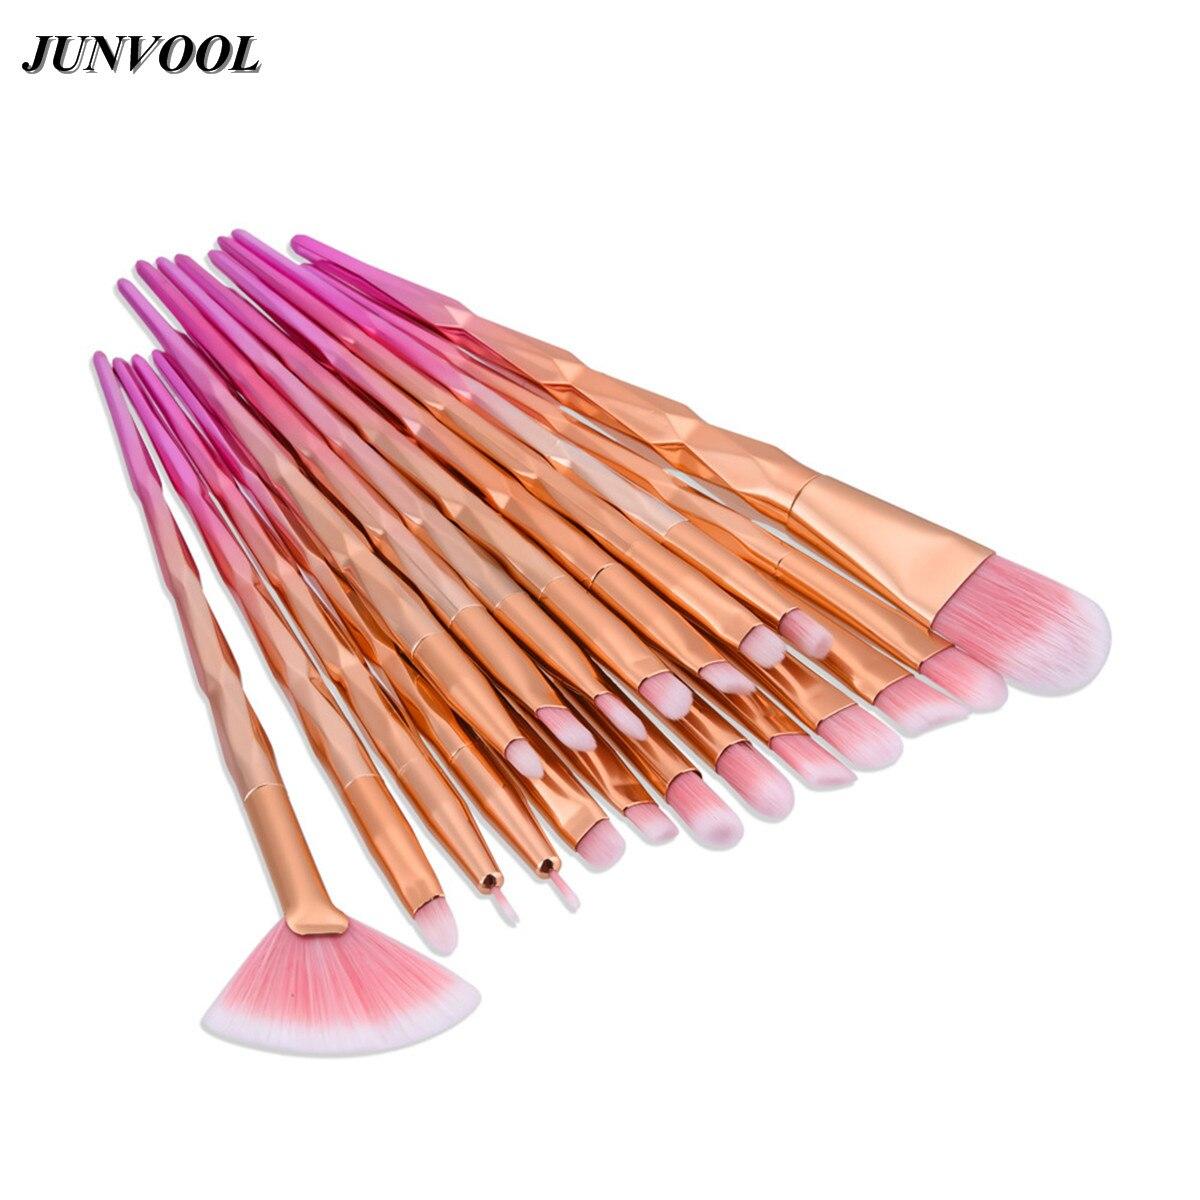 20Pcs Pink Makeup Eyes Brushes Set with Diamond Thread Handle Gold Rose Tools Powder Foundation Eye Lip Concealer Fan Brush Kit